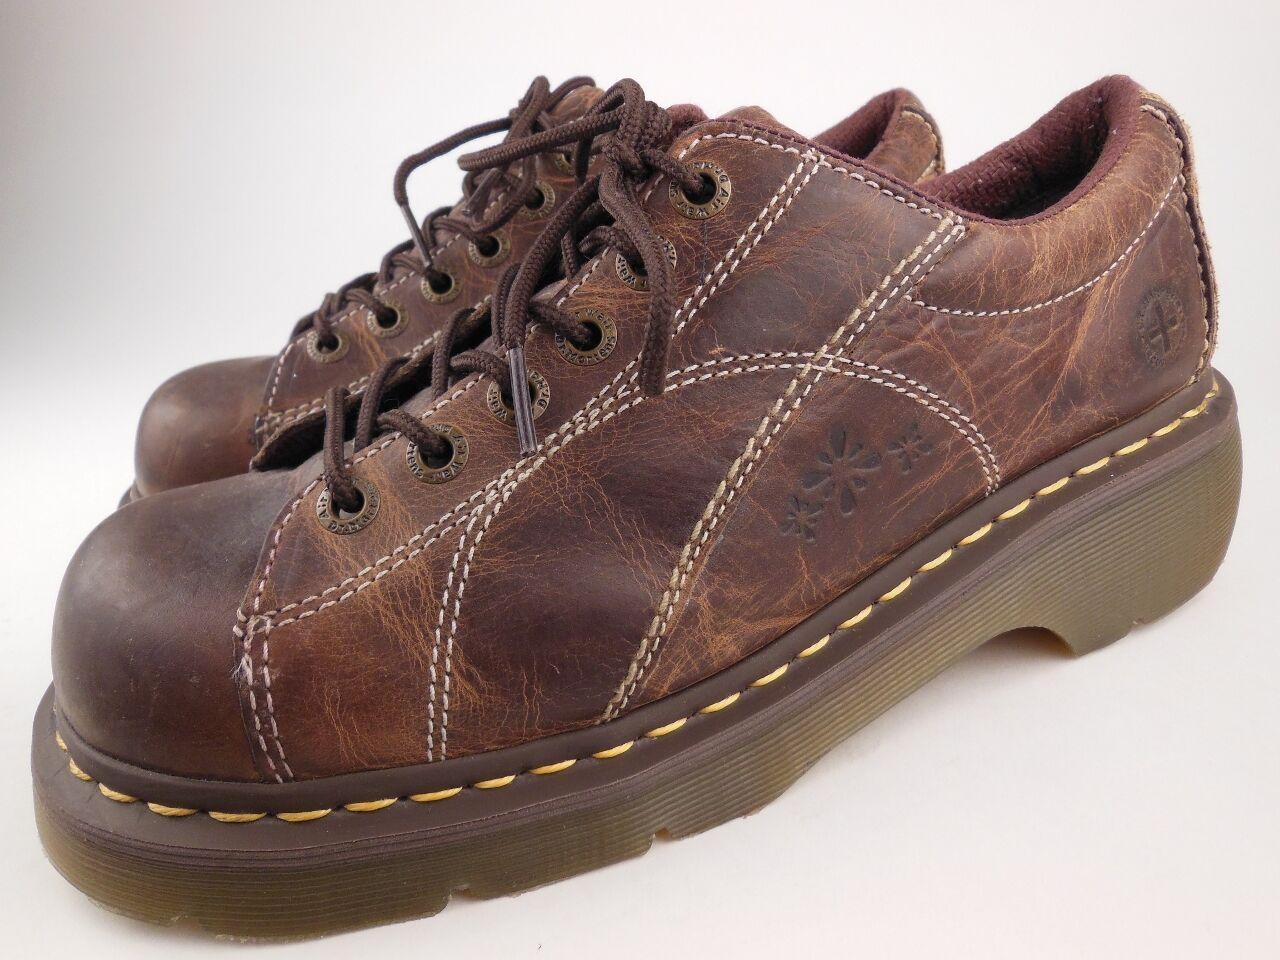 DR MARTENS 12283 Melissa Brown Leather Lace Up Oxfords shoes Women's Size 11